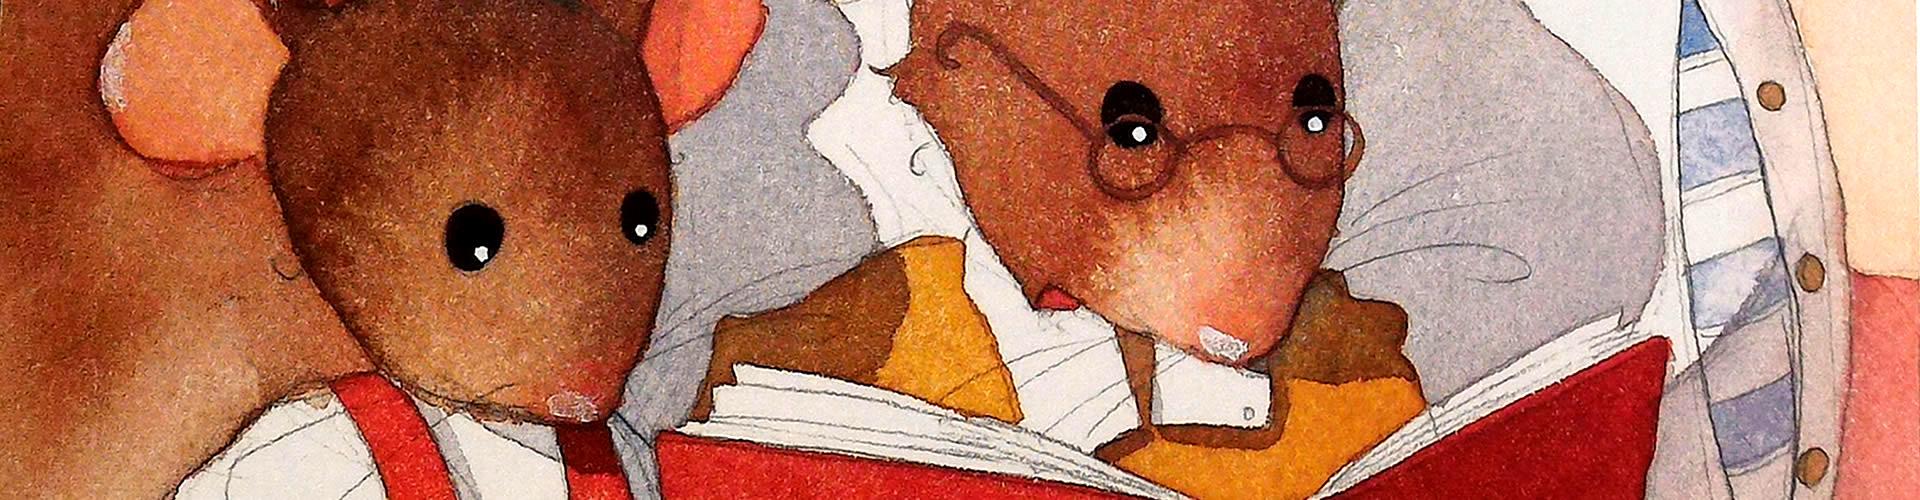 Povesti pentru copii de 2 ani- Editura-DPH -isbn-9786066831512